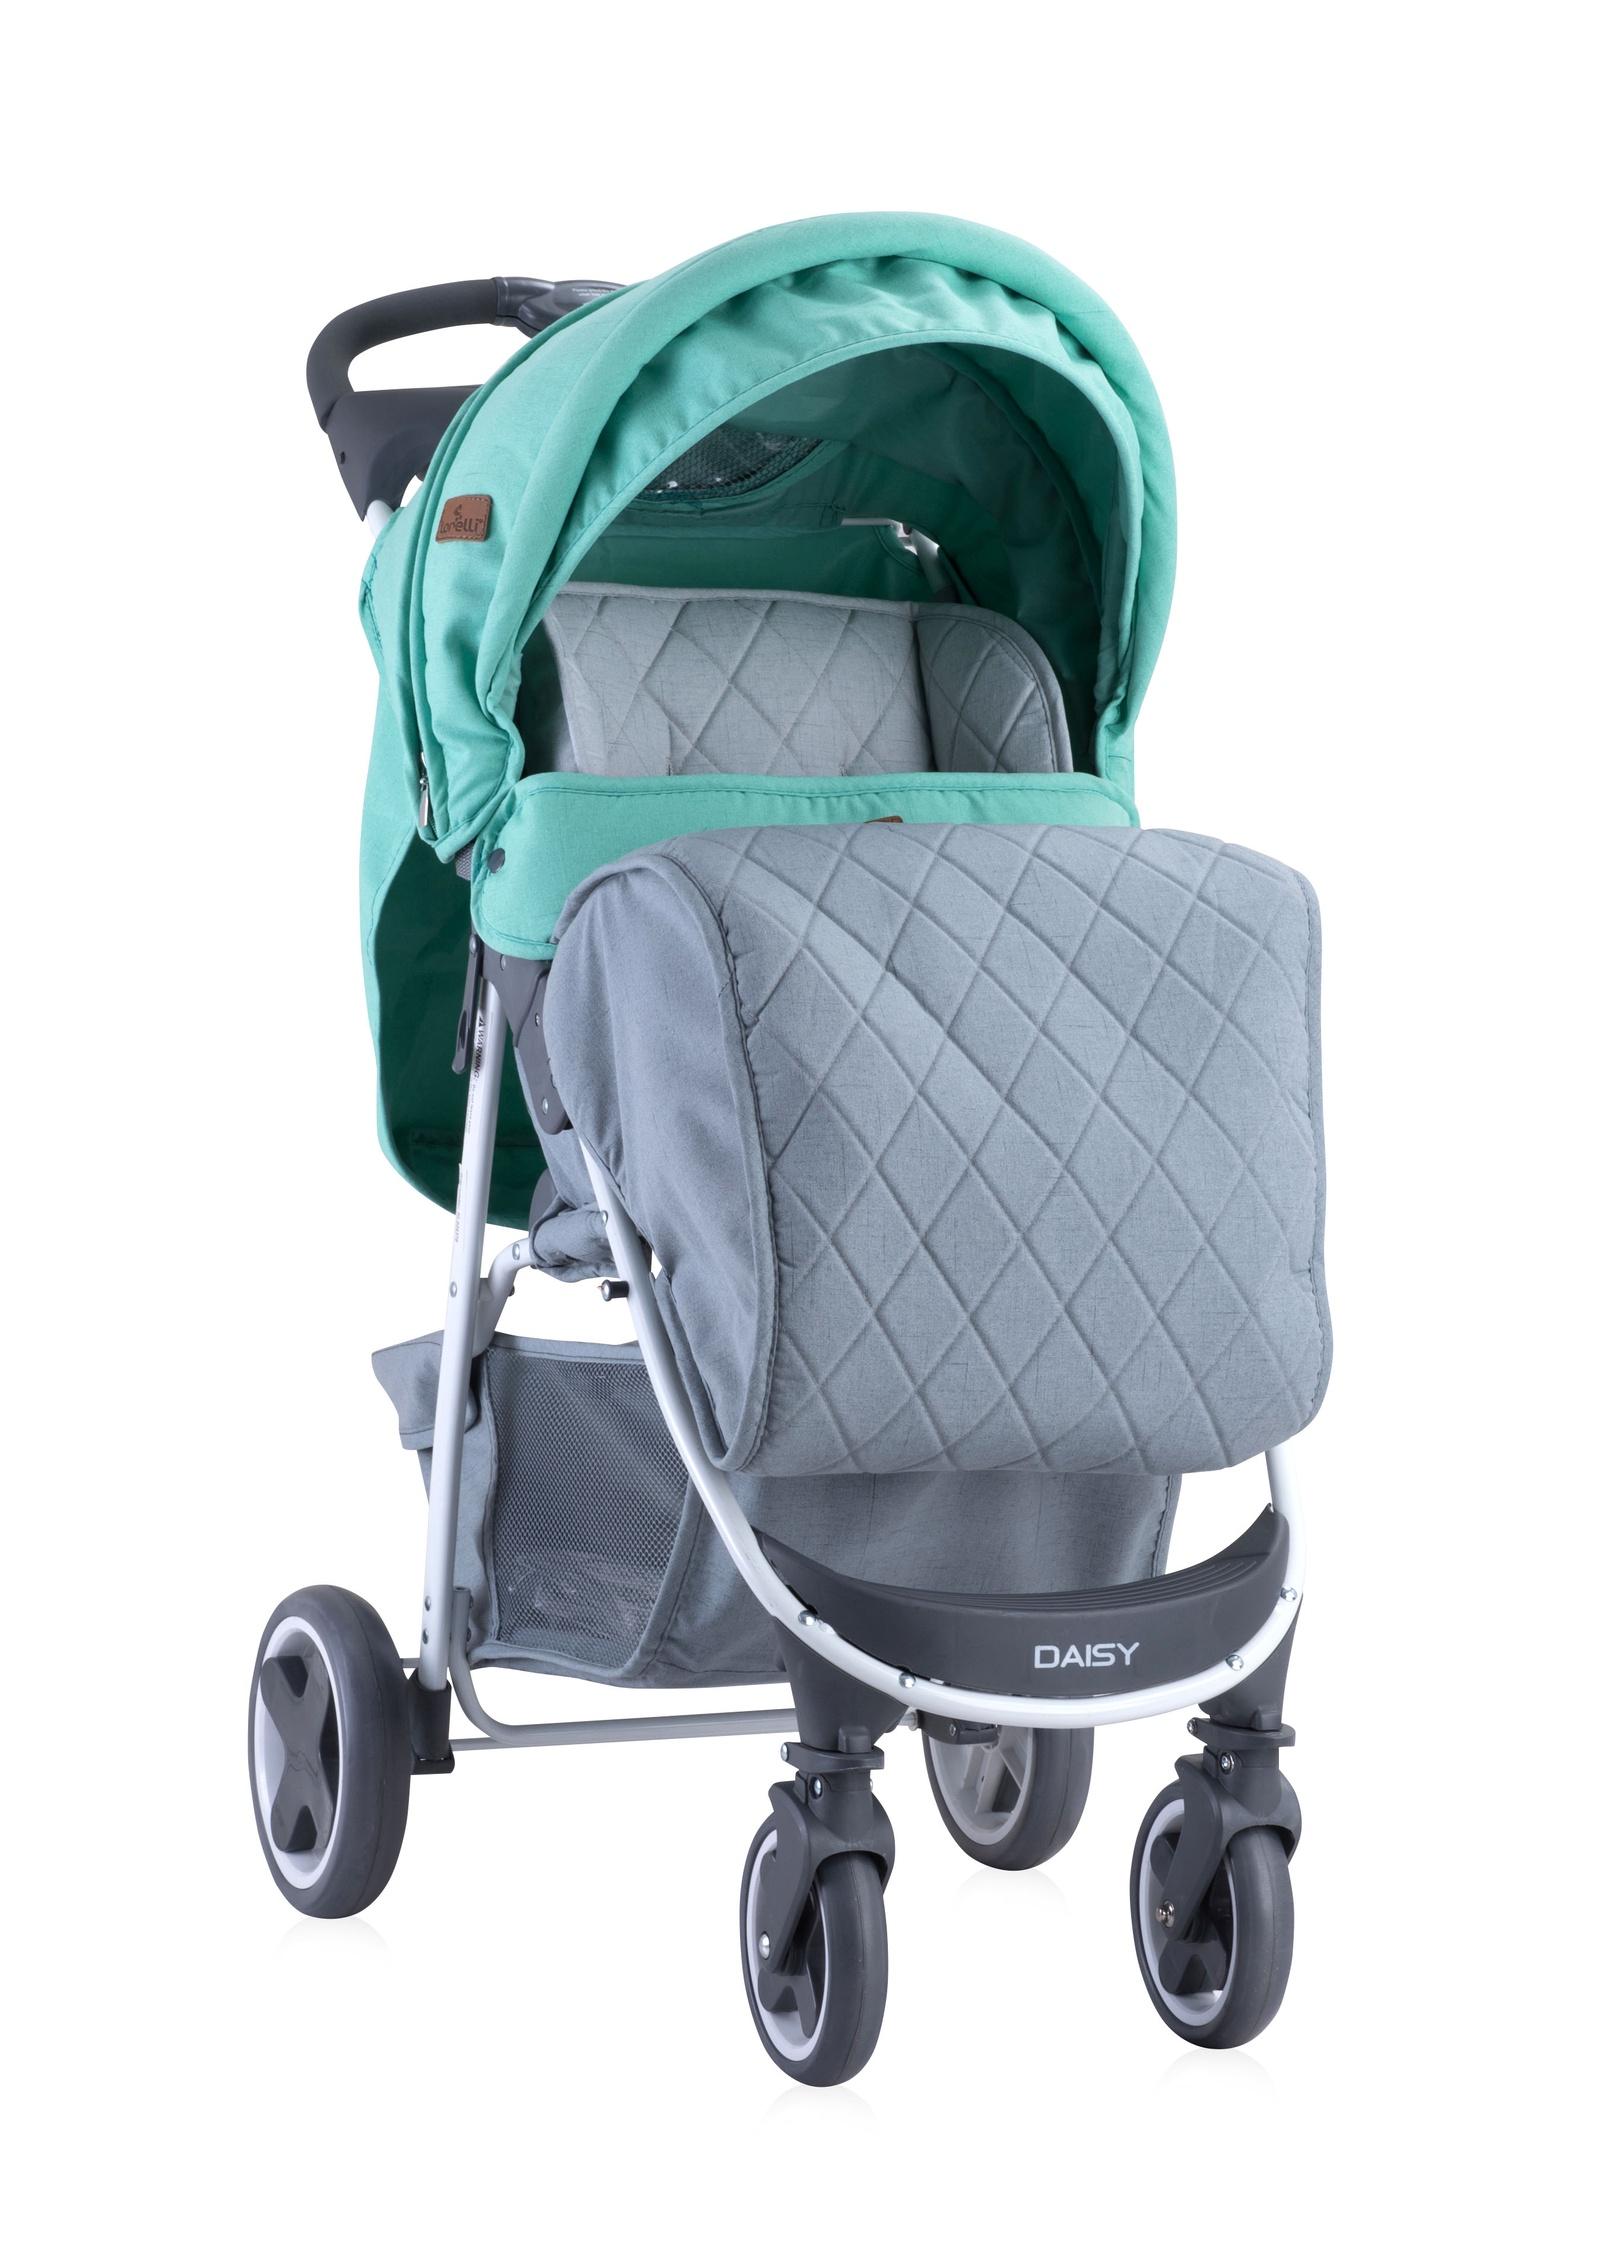 Прогулочная коляска Lorelli Daisy с накидкой на ножки цвет зелено-серый, Green&Grey